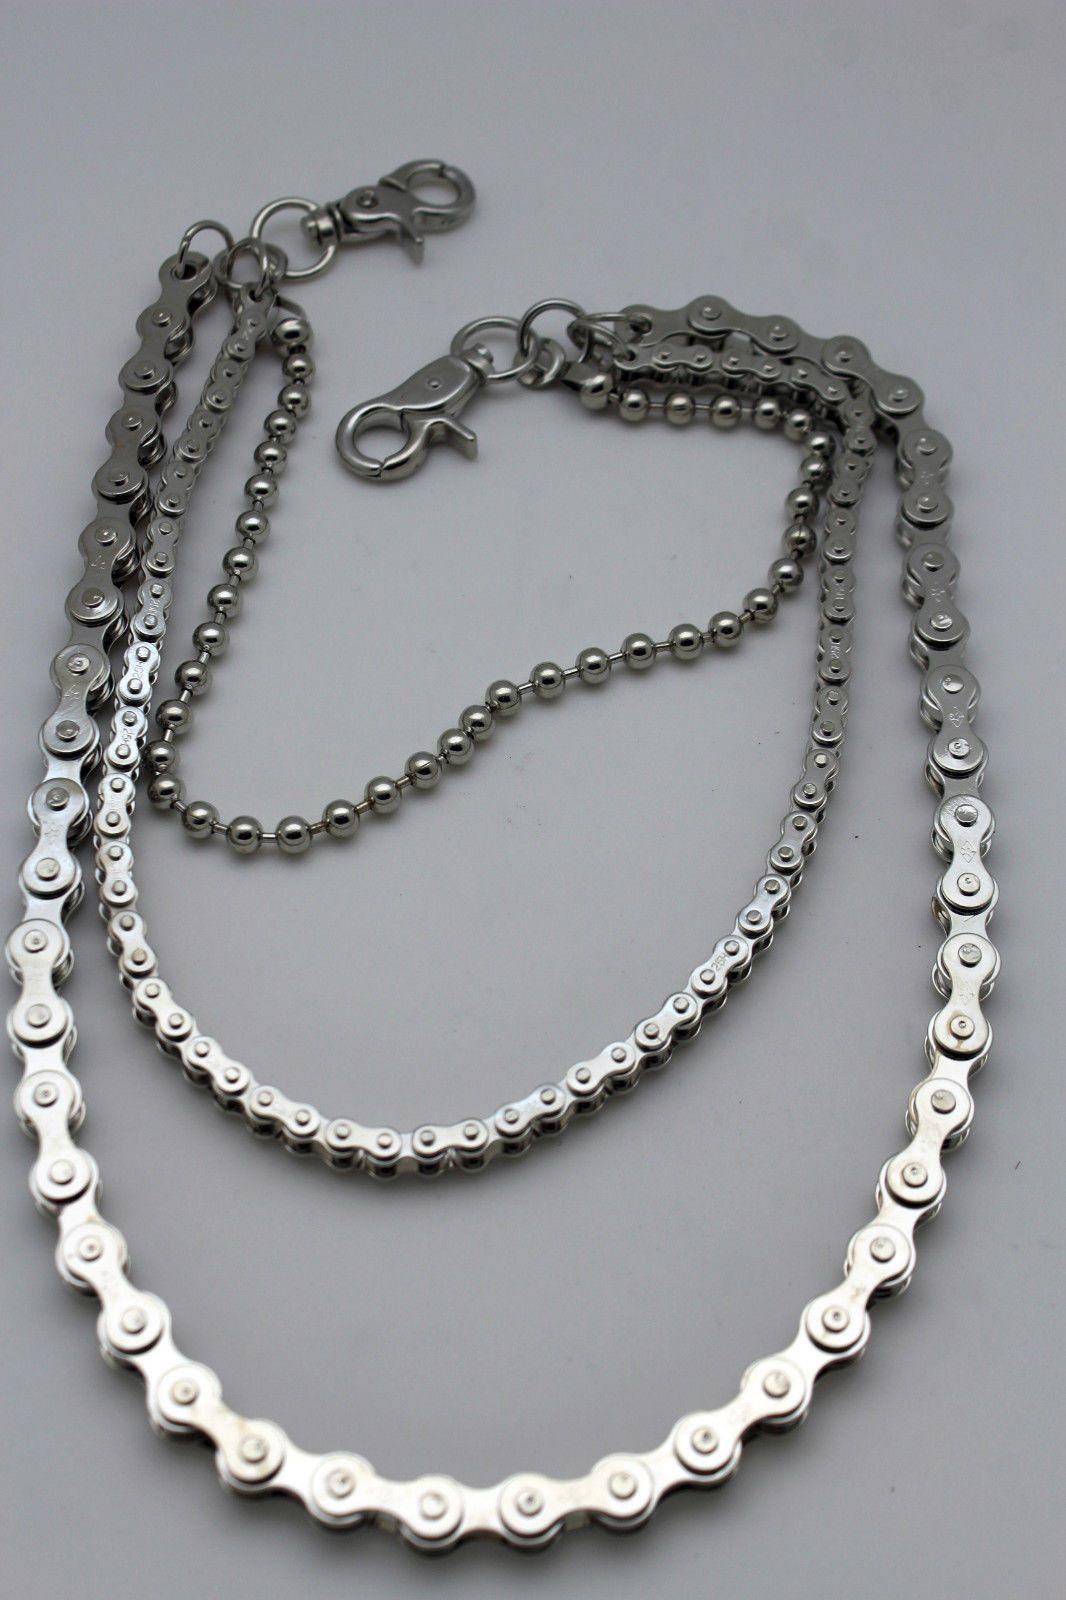 Men Silver Metal Wallet Fashion Key Chain Motorcycle Chain Links Biker Rocker